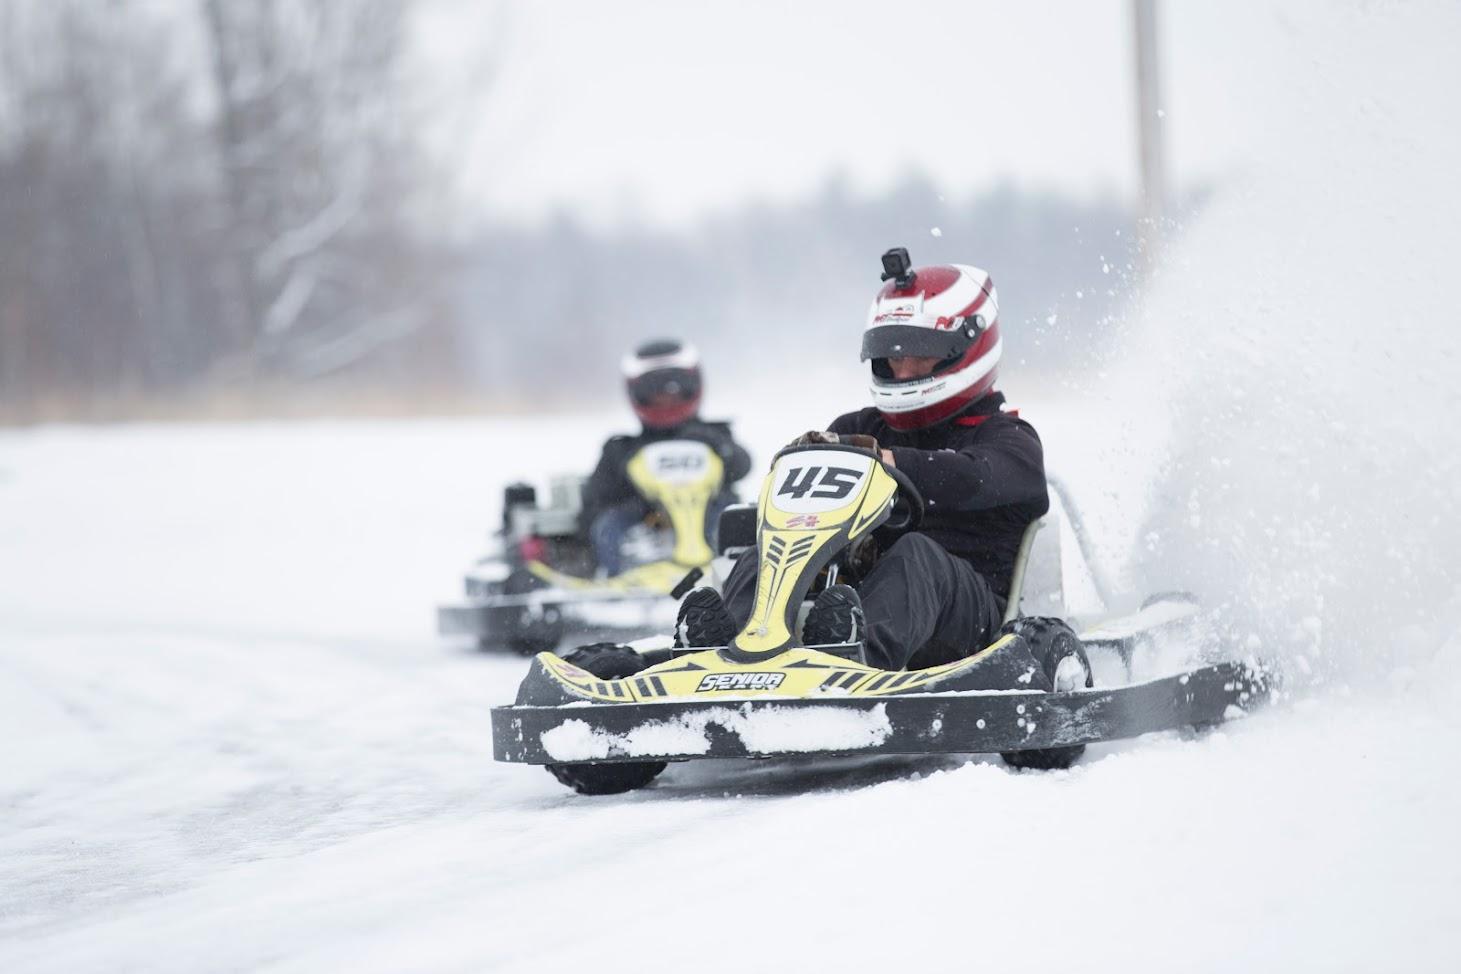 Ice karting at sh karting for Go kart montreal exterieur